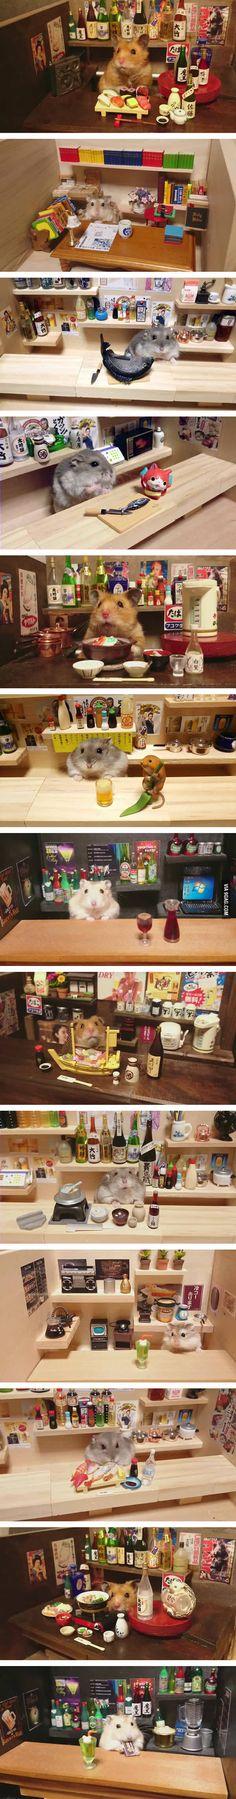 Hamster bartender (by Kawanabesatou)